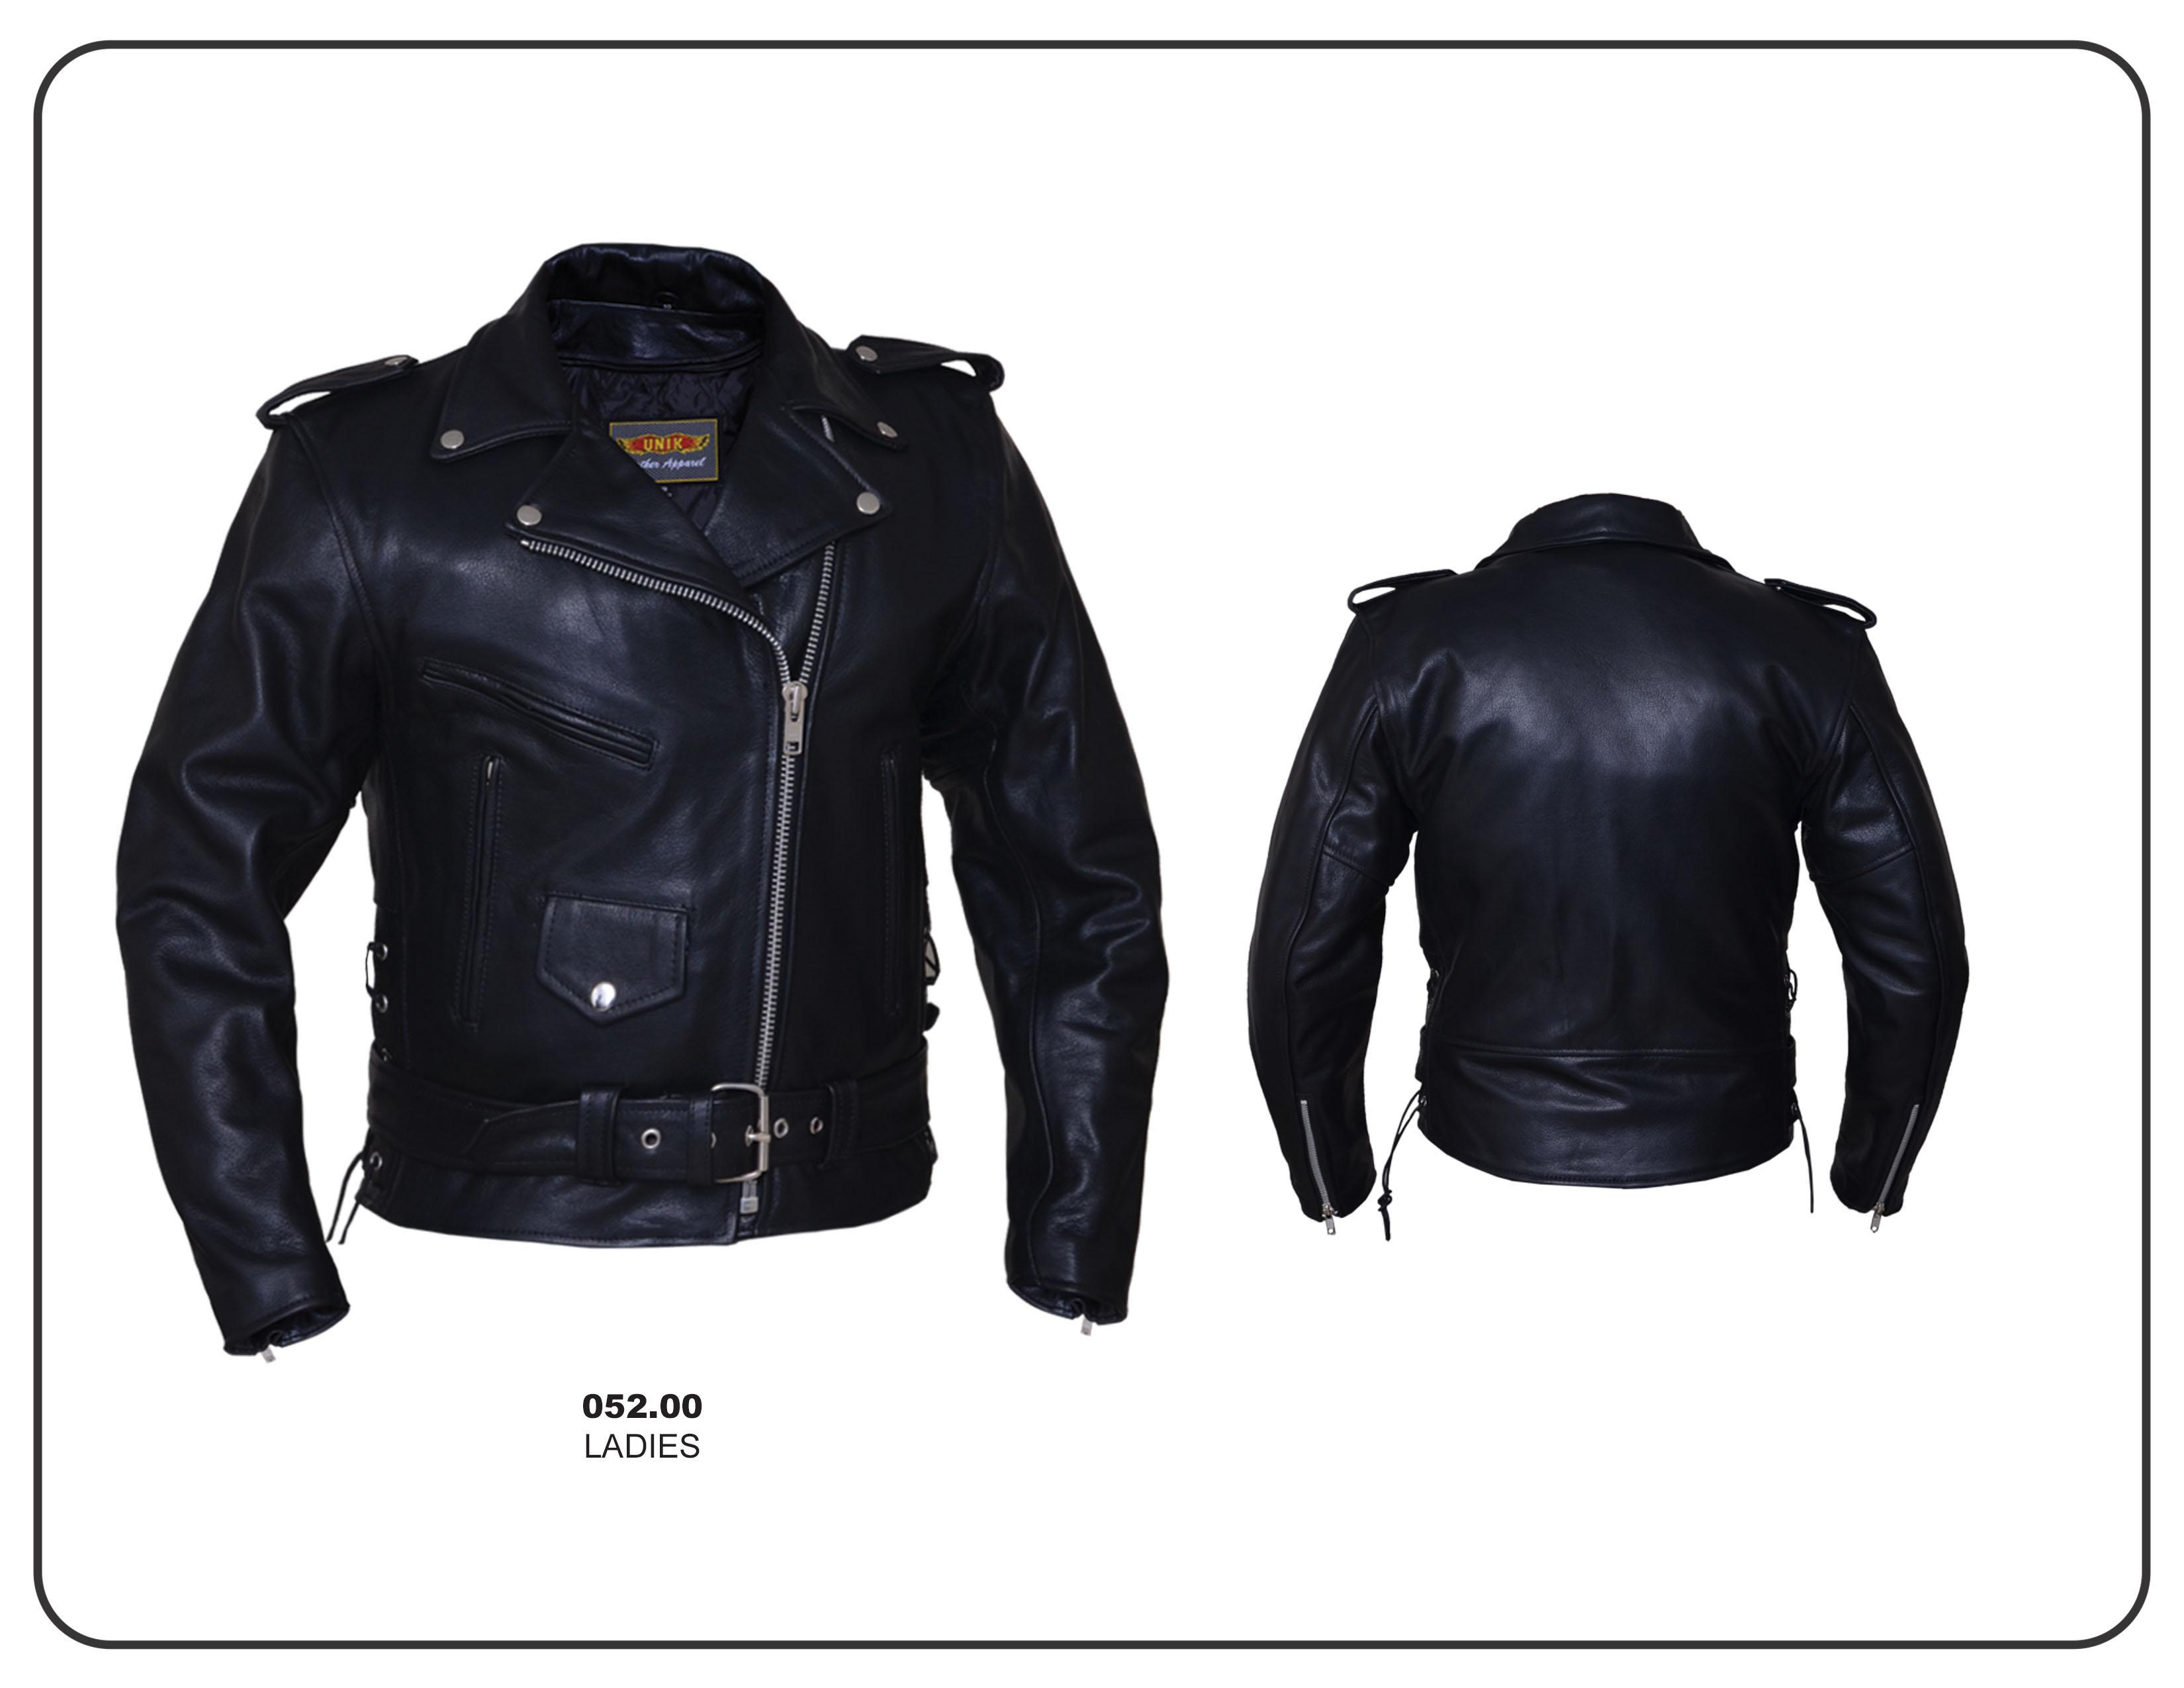 Premium Buffalo Womens Motorcycle Jacket by Unik Leather